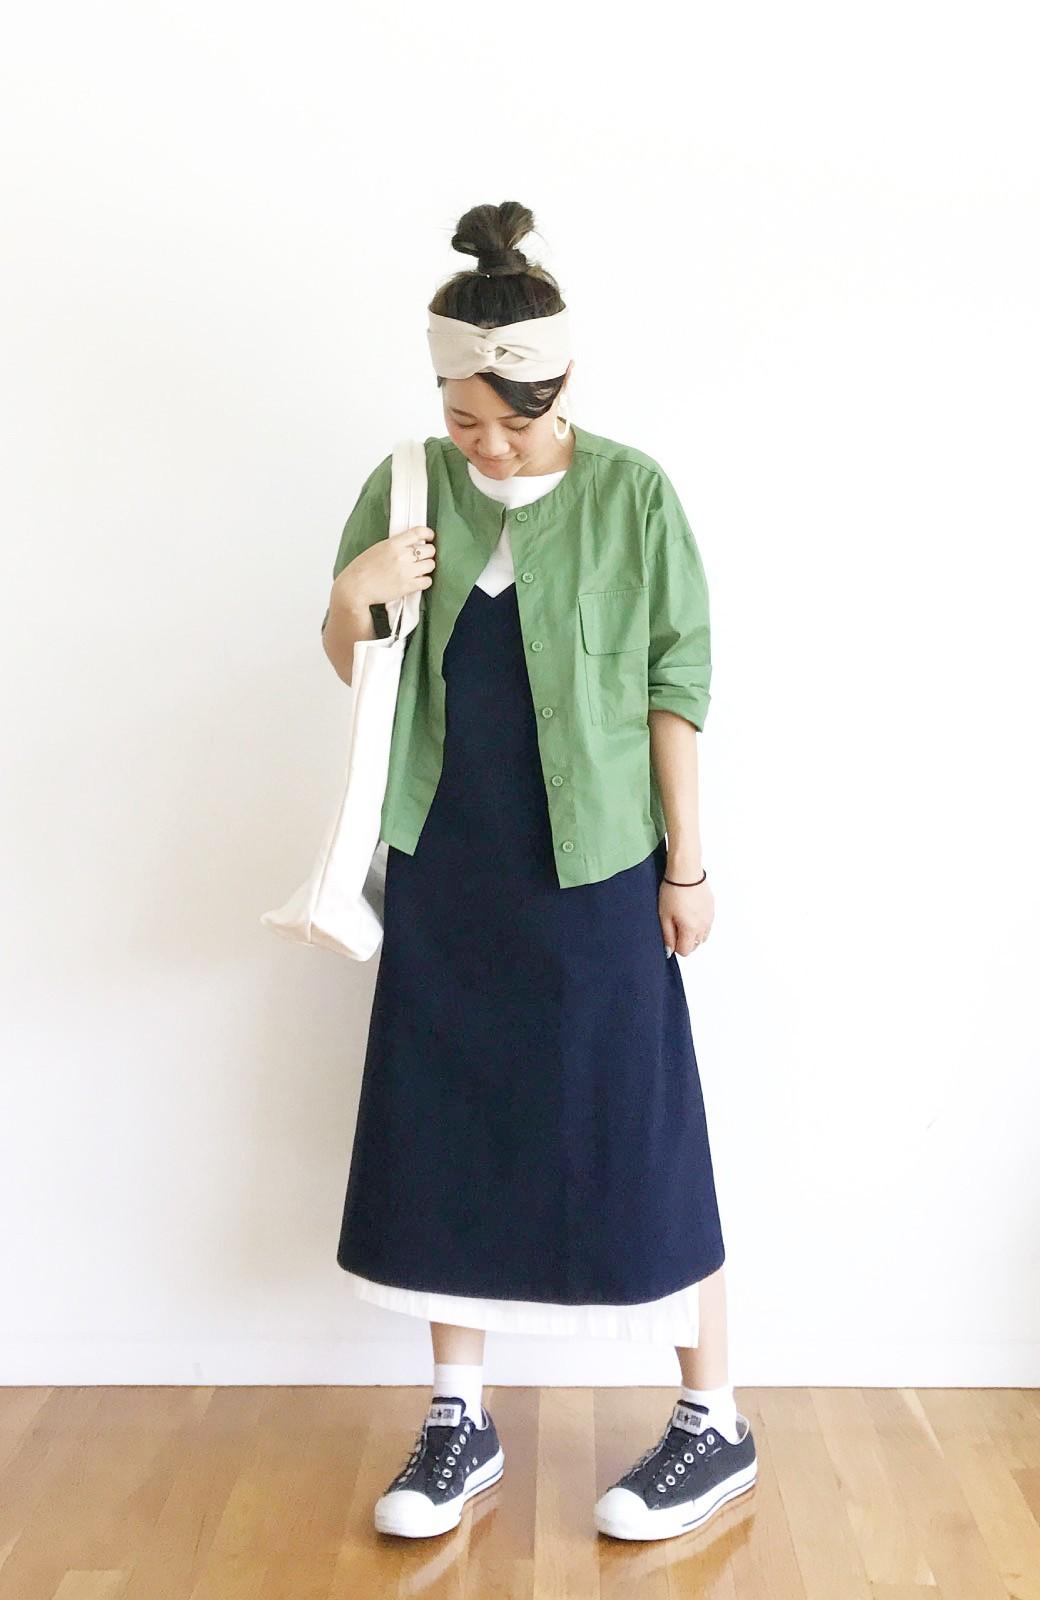 haco! 【ずぼら党】すぽっと着るだけ即完成! ずぼらさんのための気取らず着られて洗濯機洗いできるワンピ2枚セット <ホワイト×ネイビー>の商品写真12